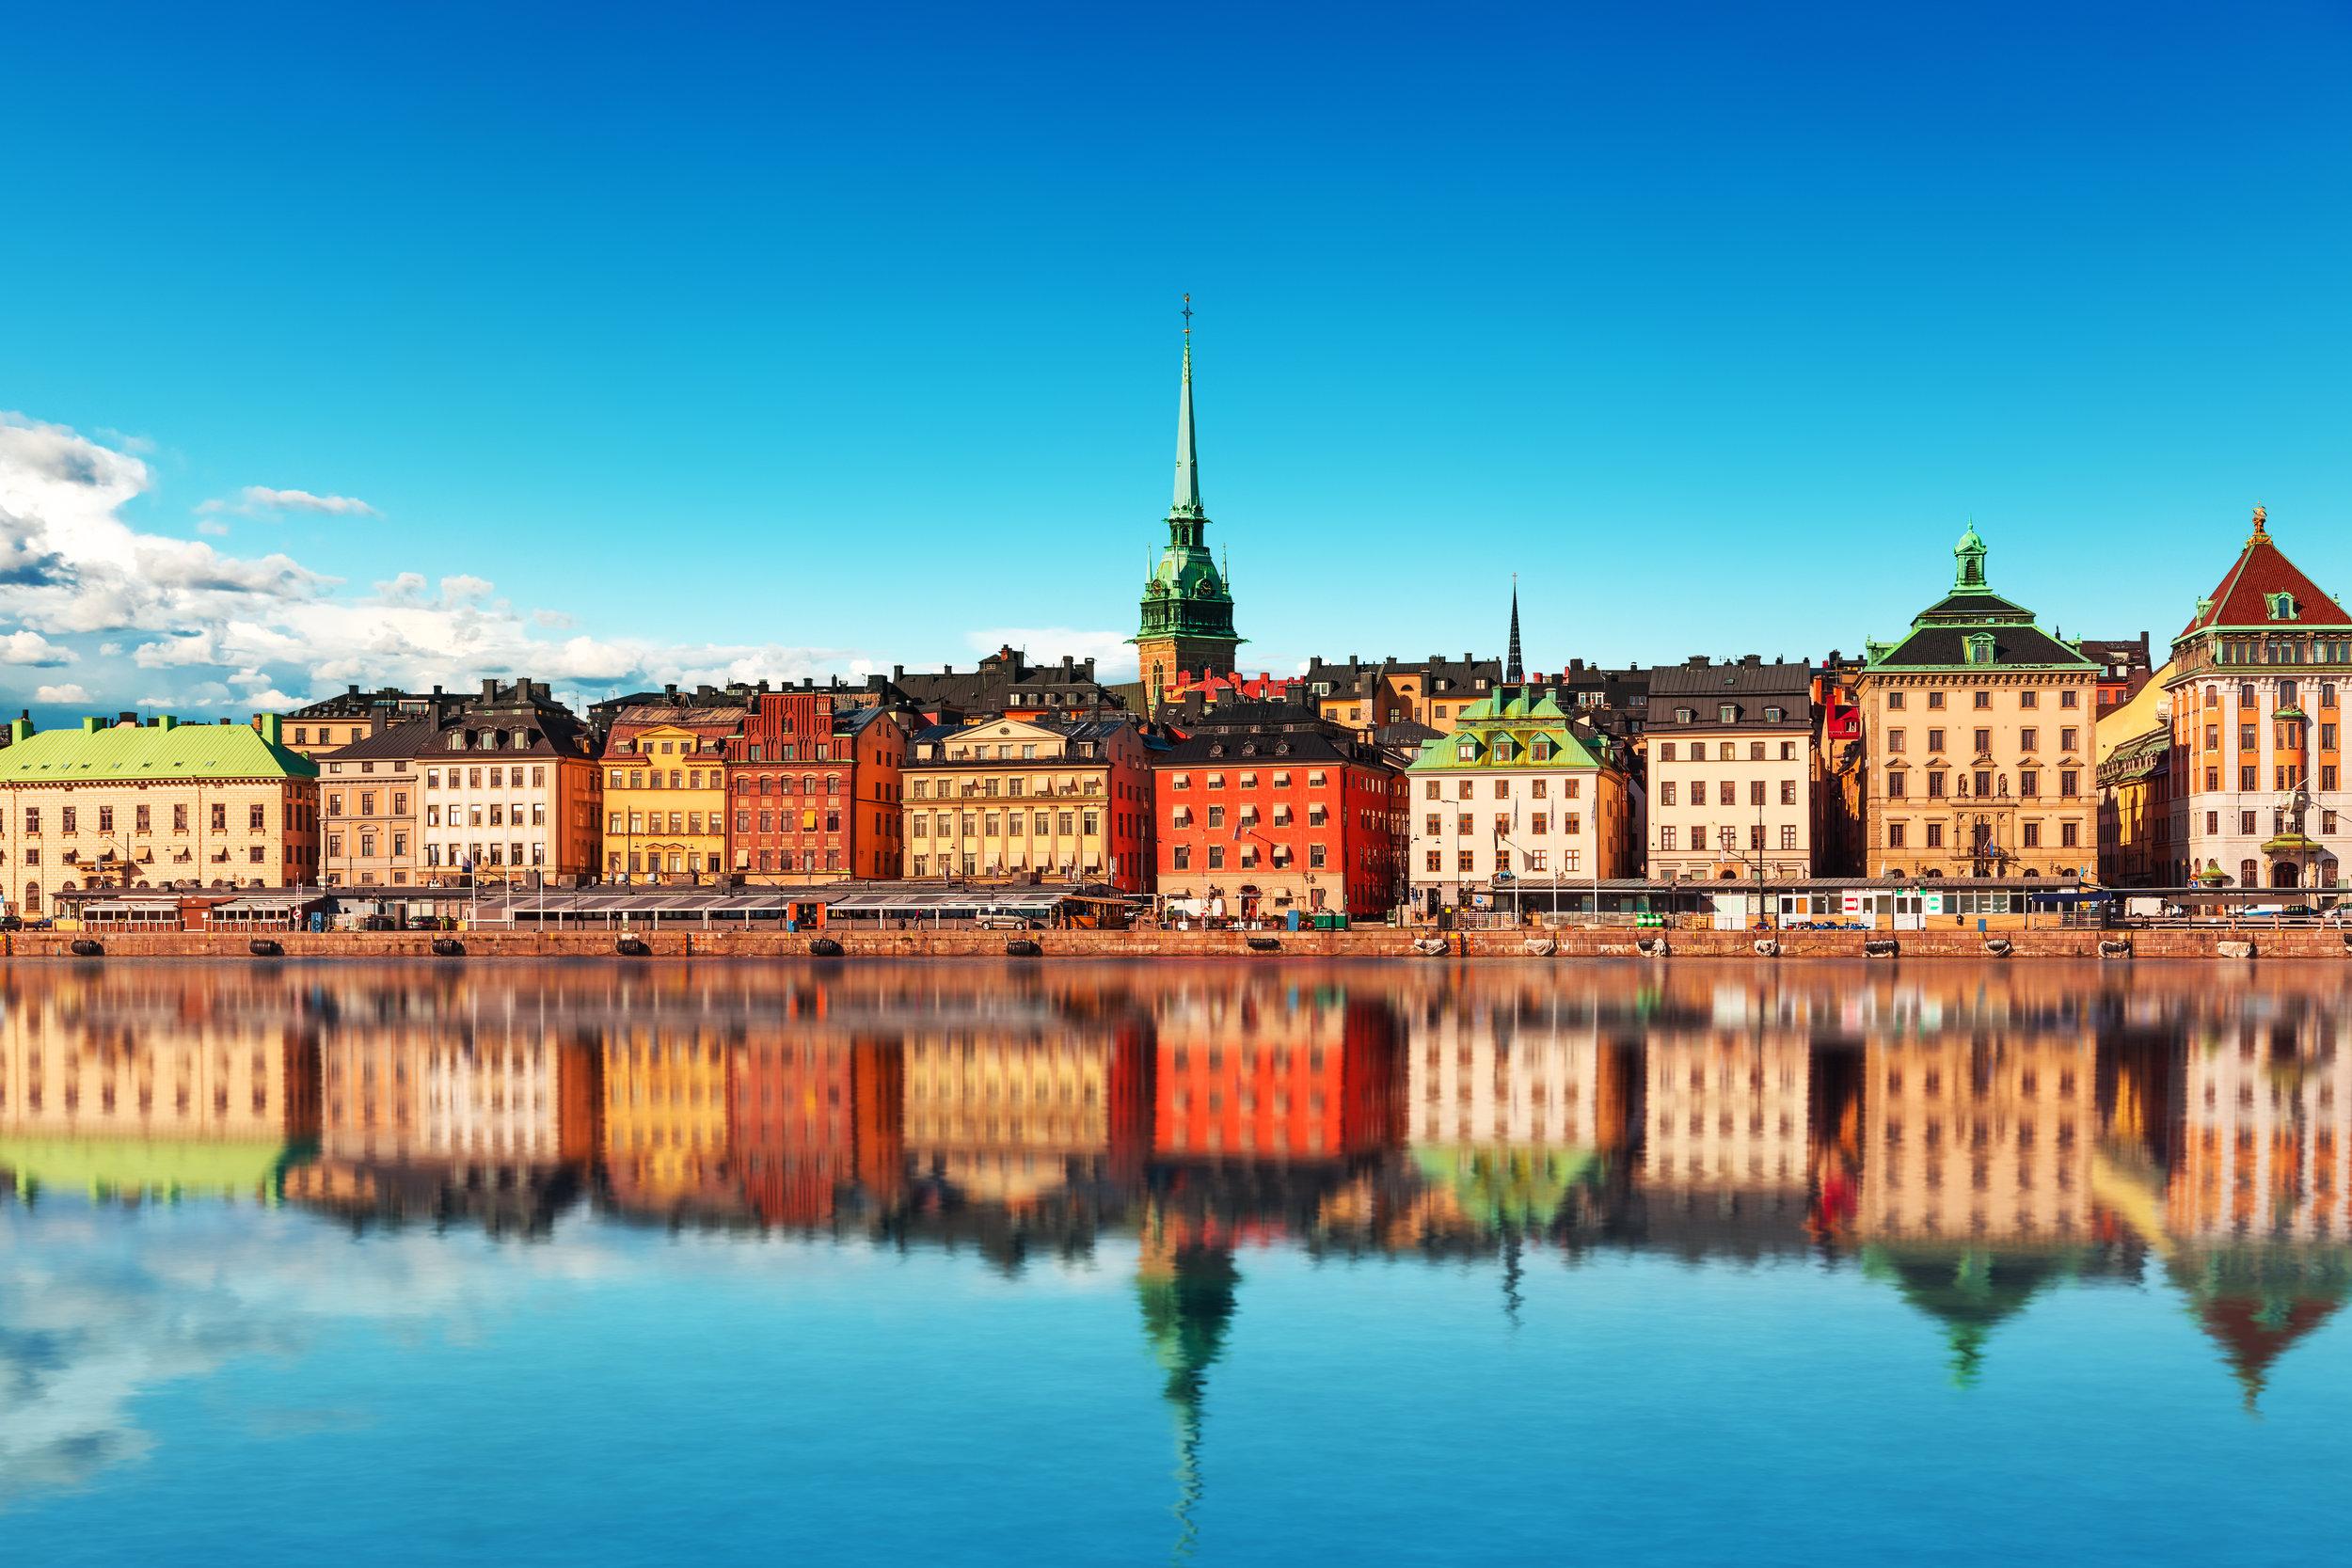 Stockholm … not exactly 'destroyed,' just light on affordable units